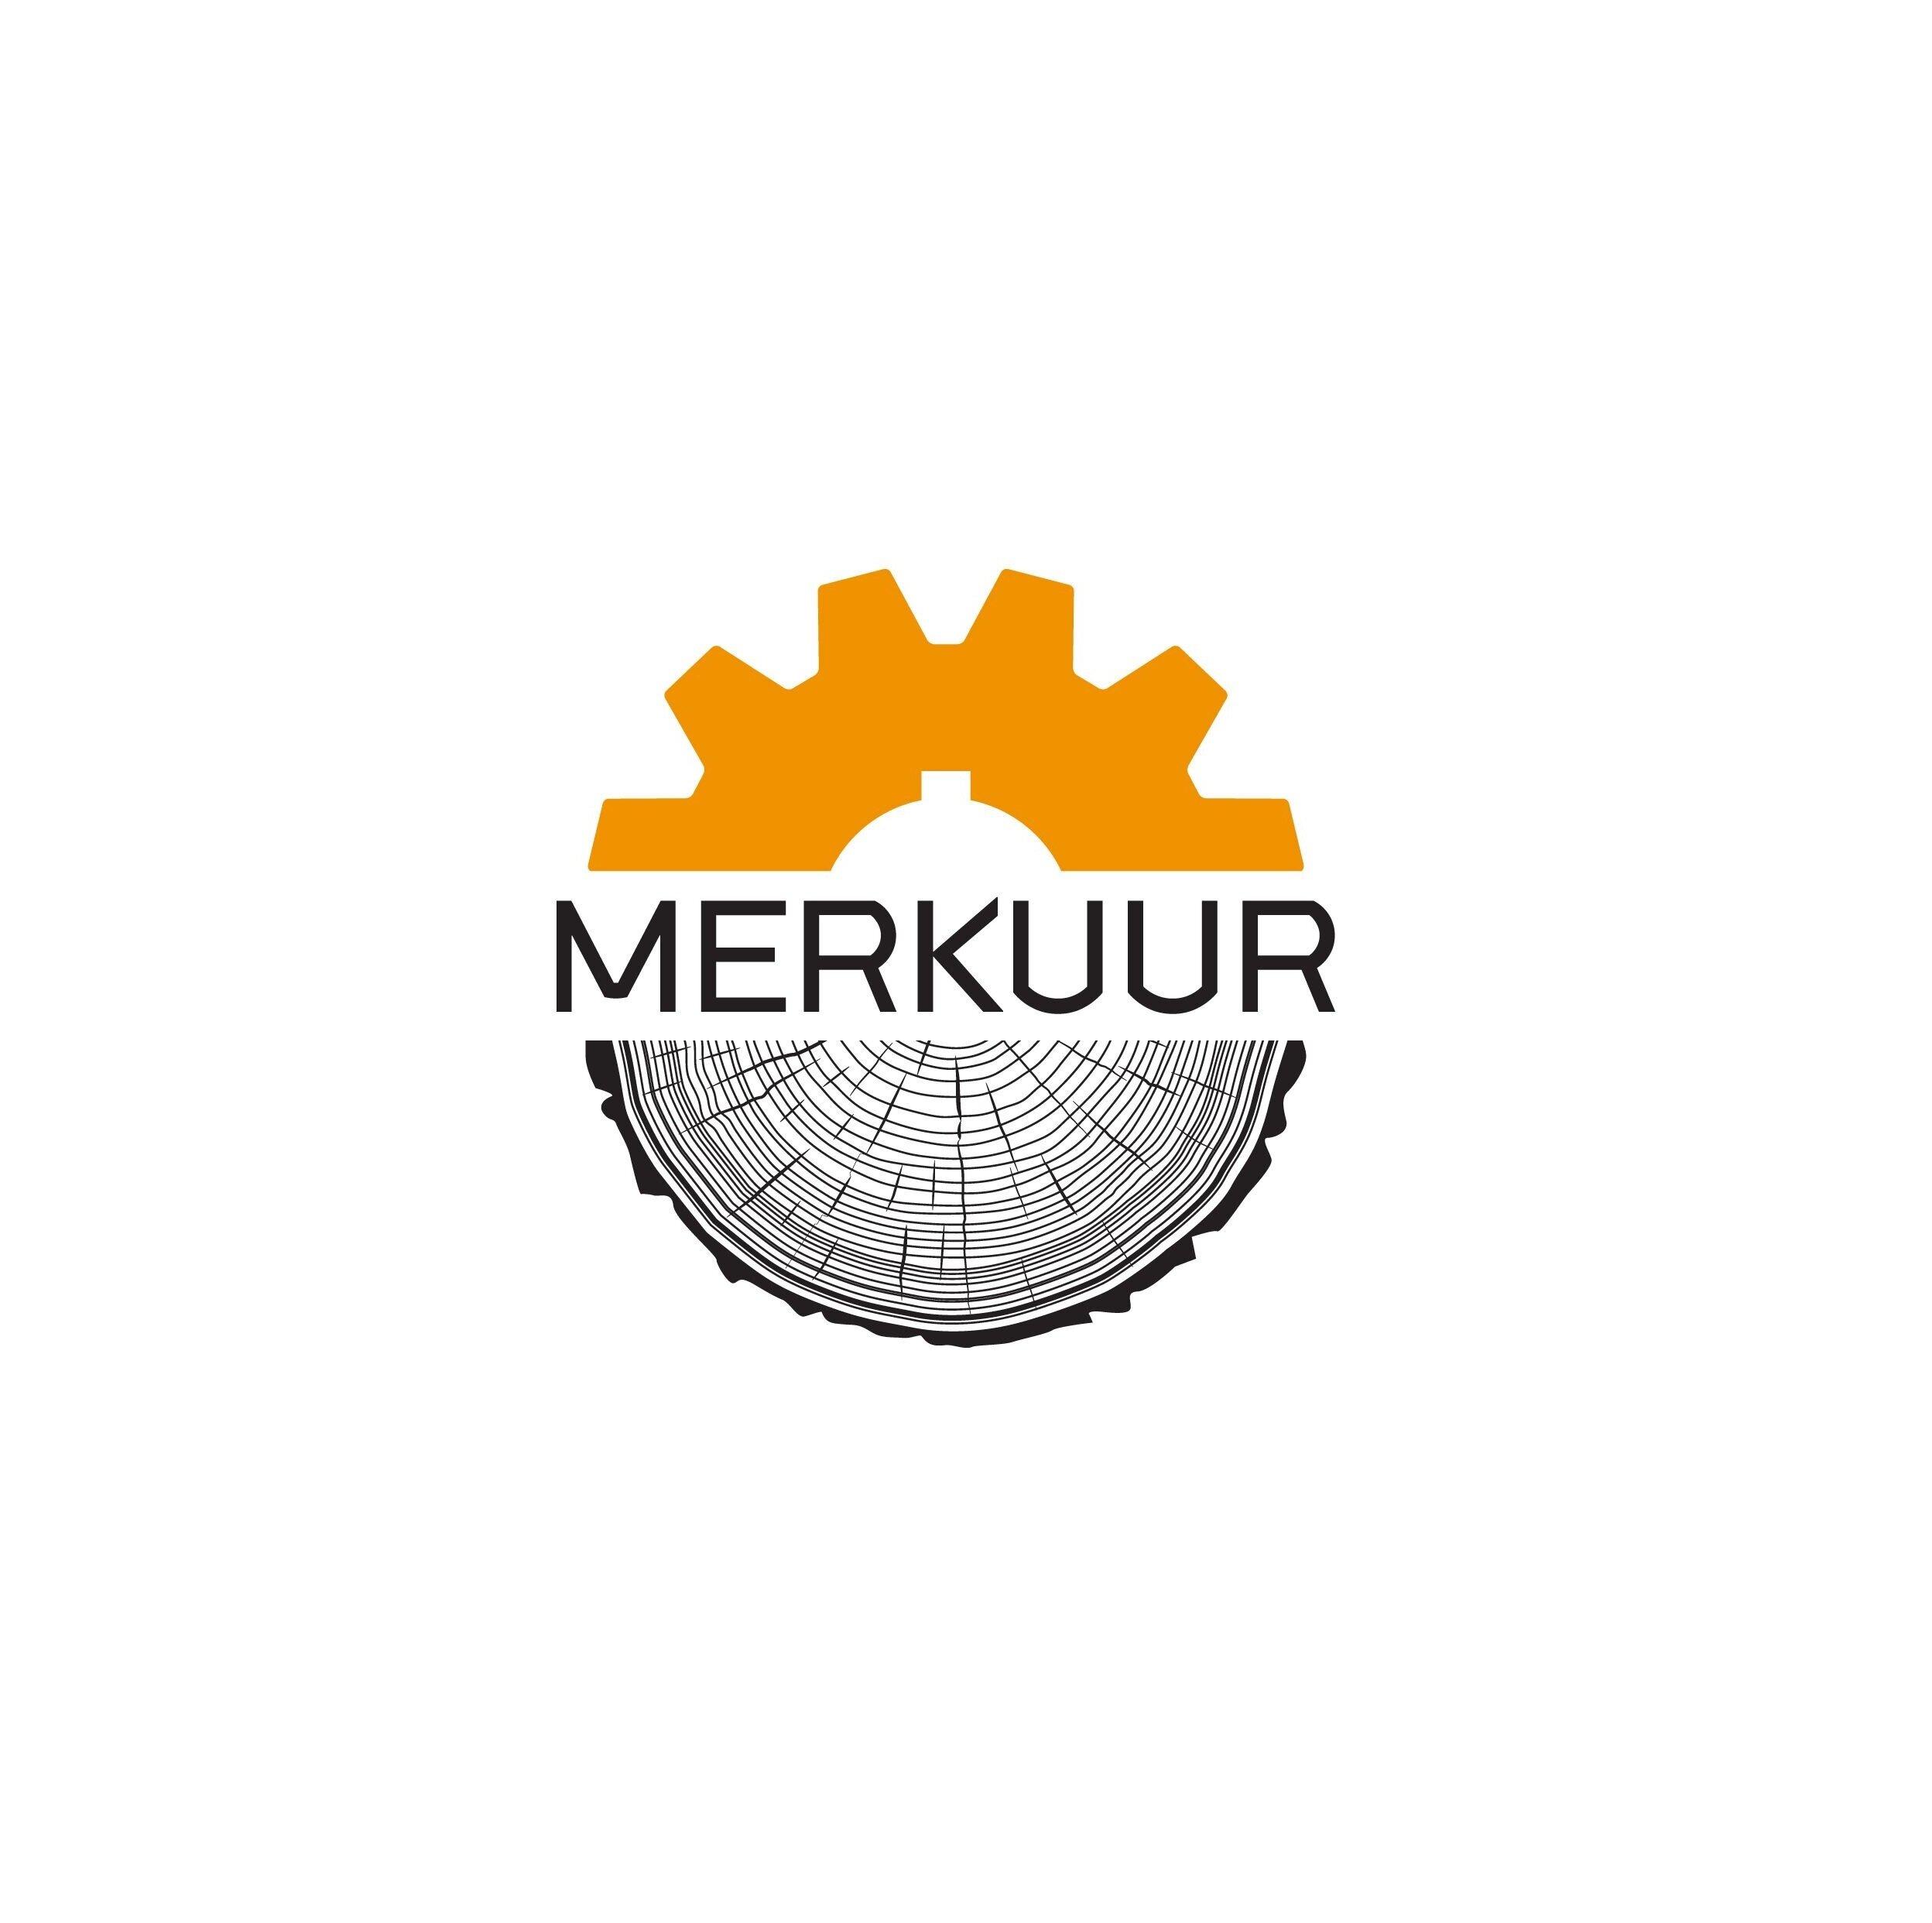 Merkuur.jpg